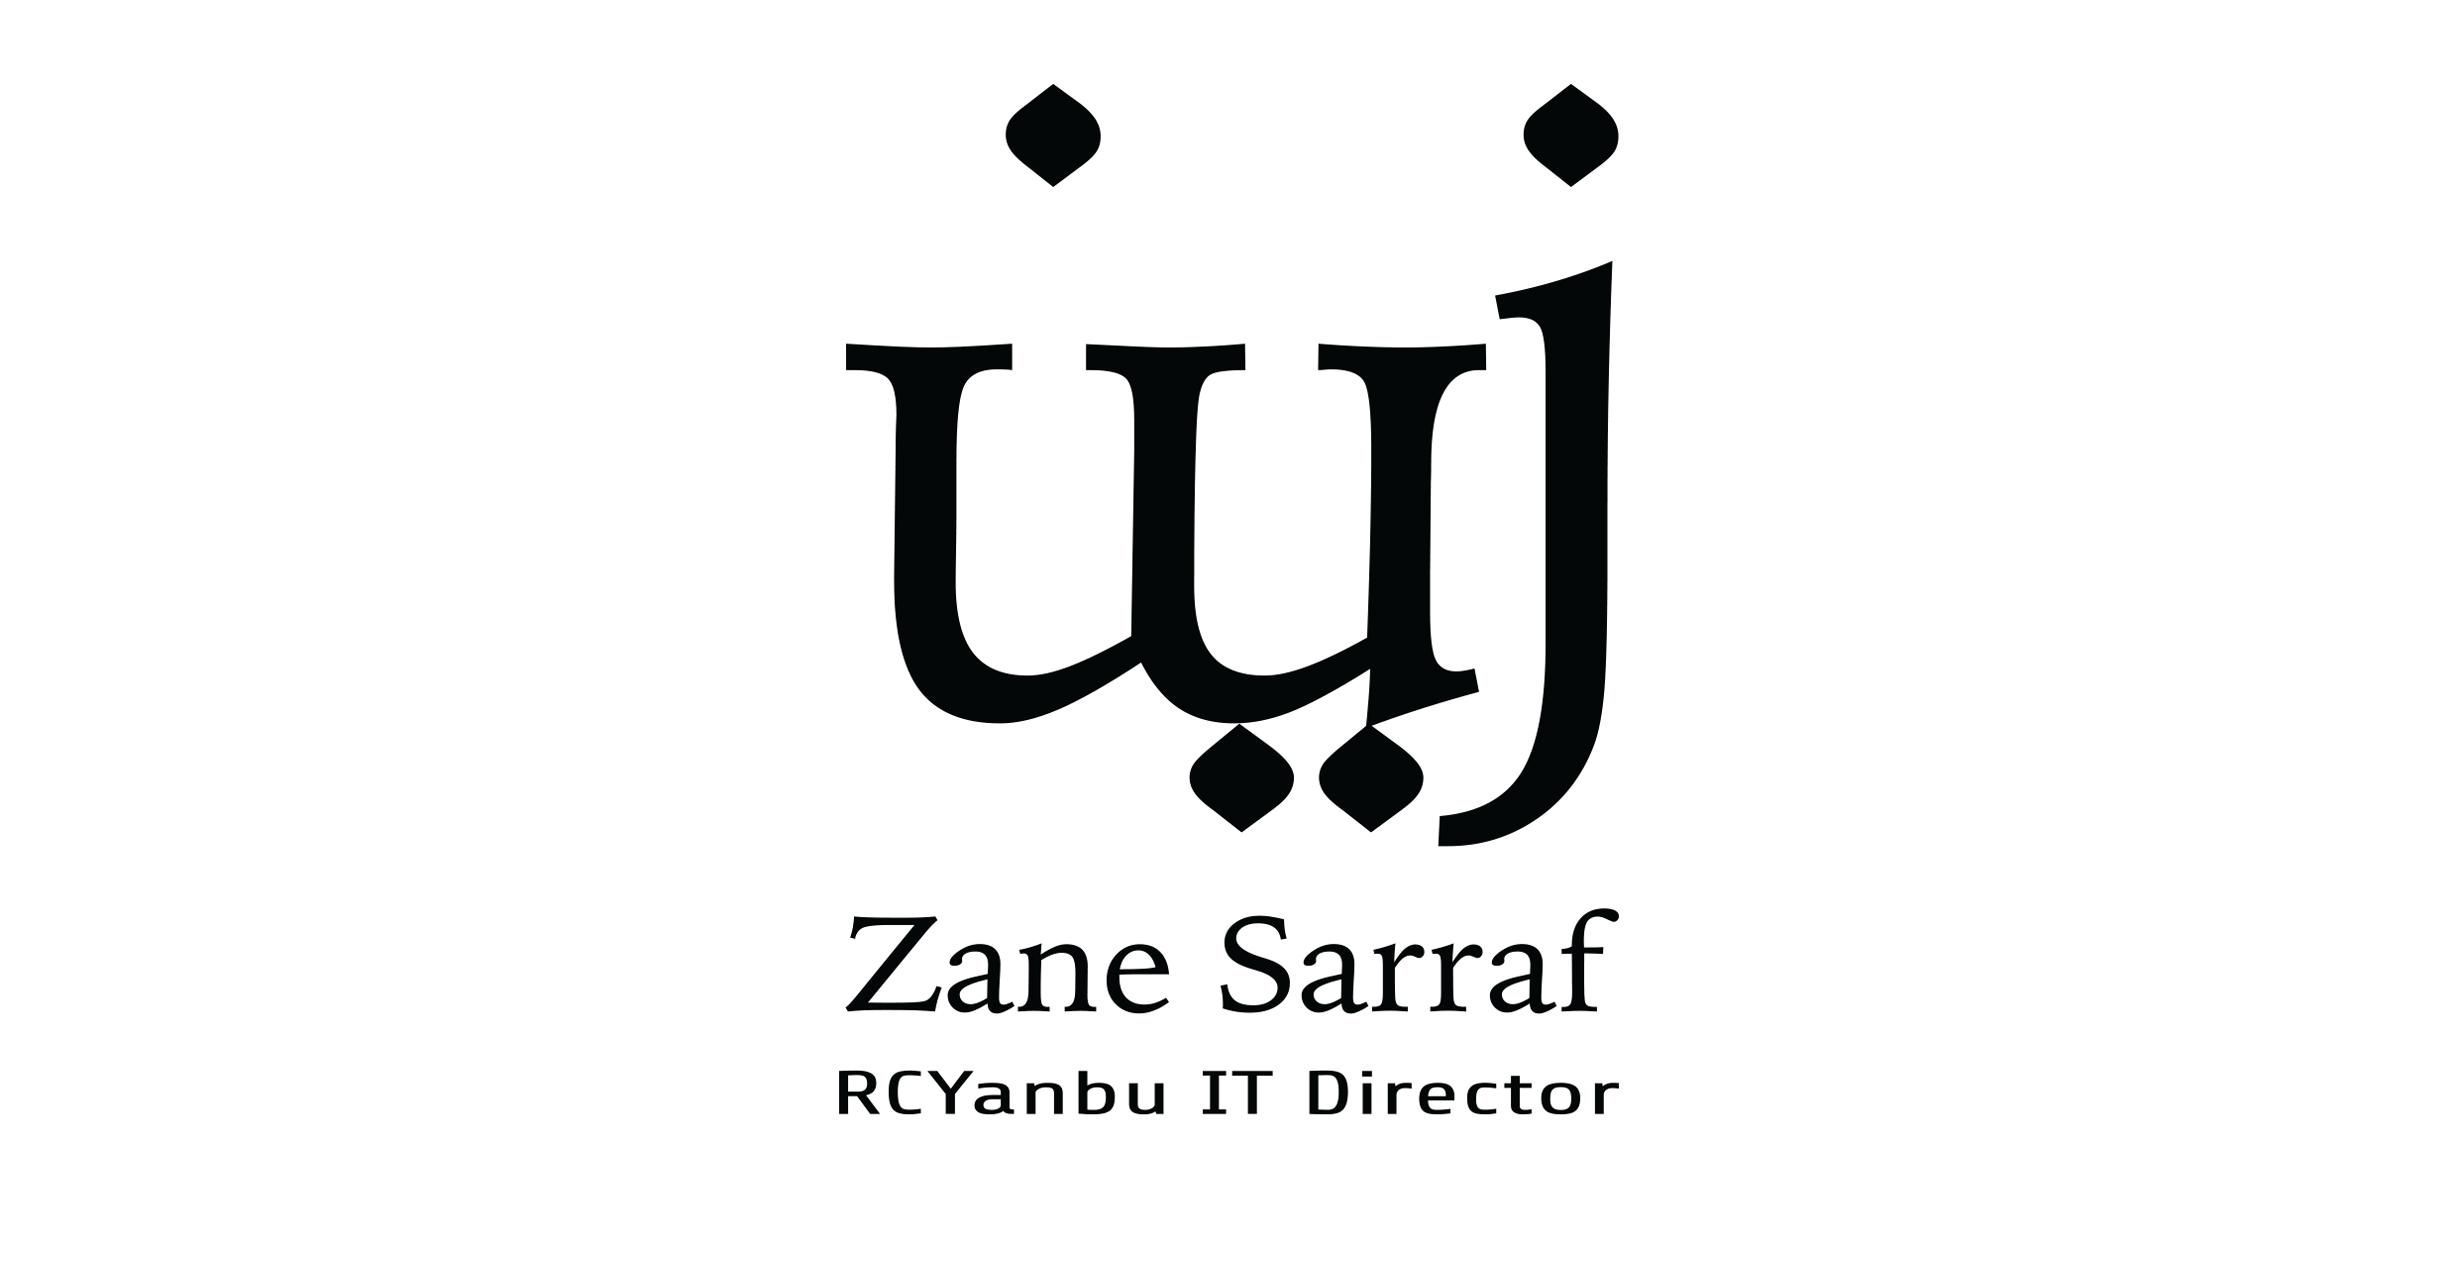 zane sarraf logo design by momenarts